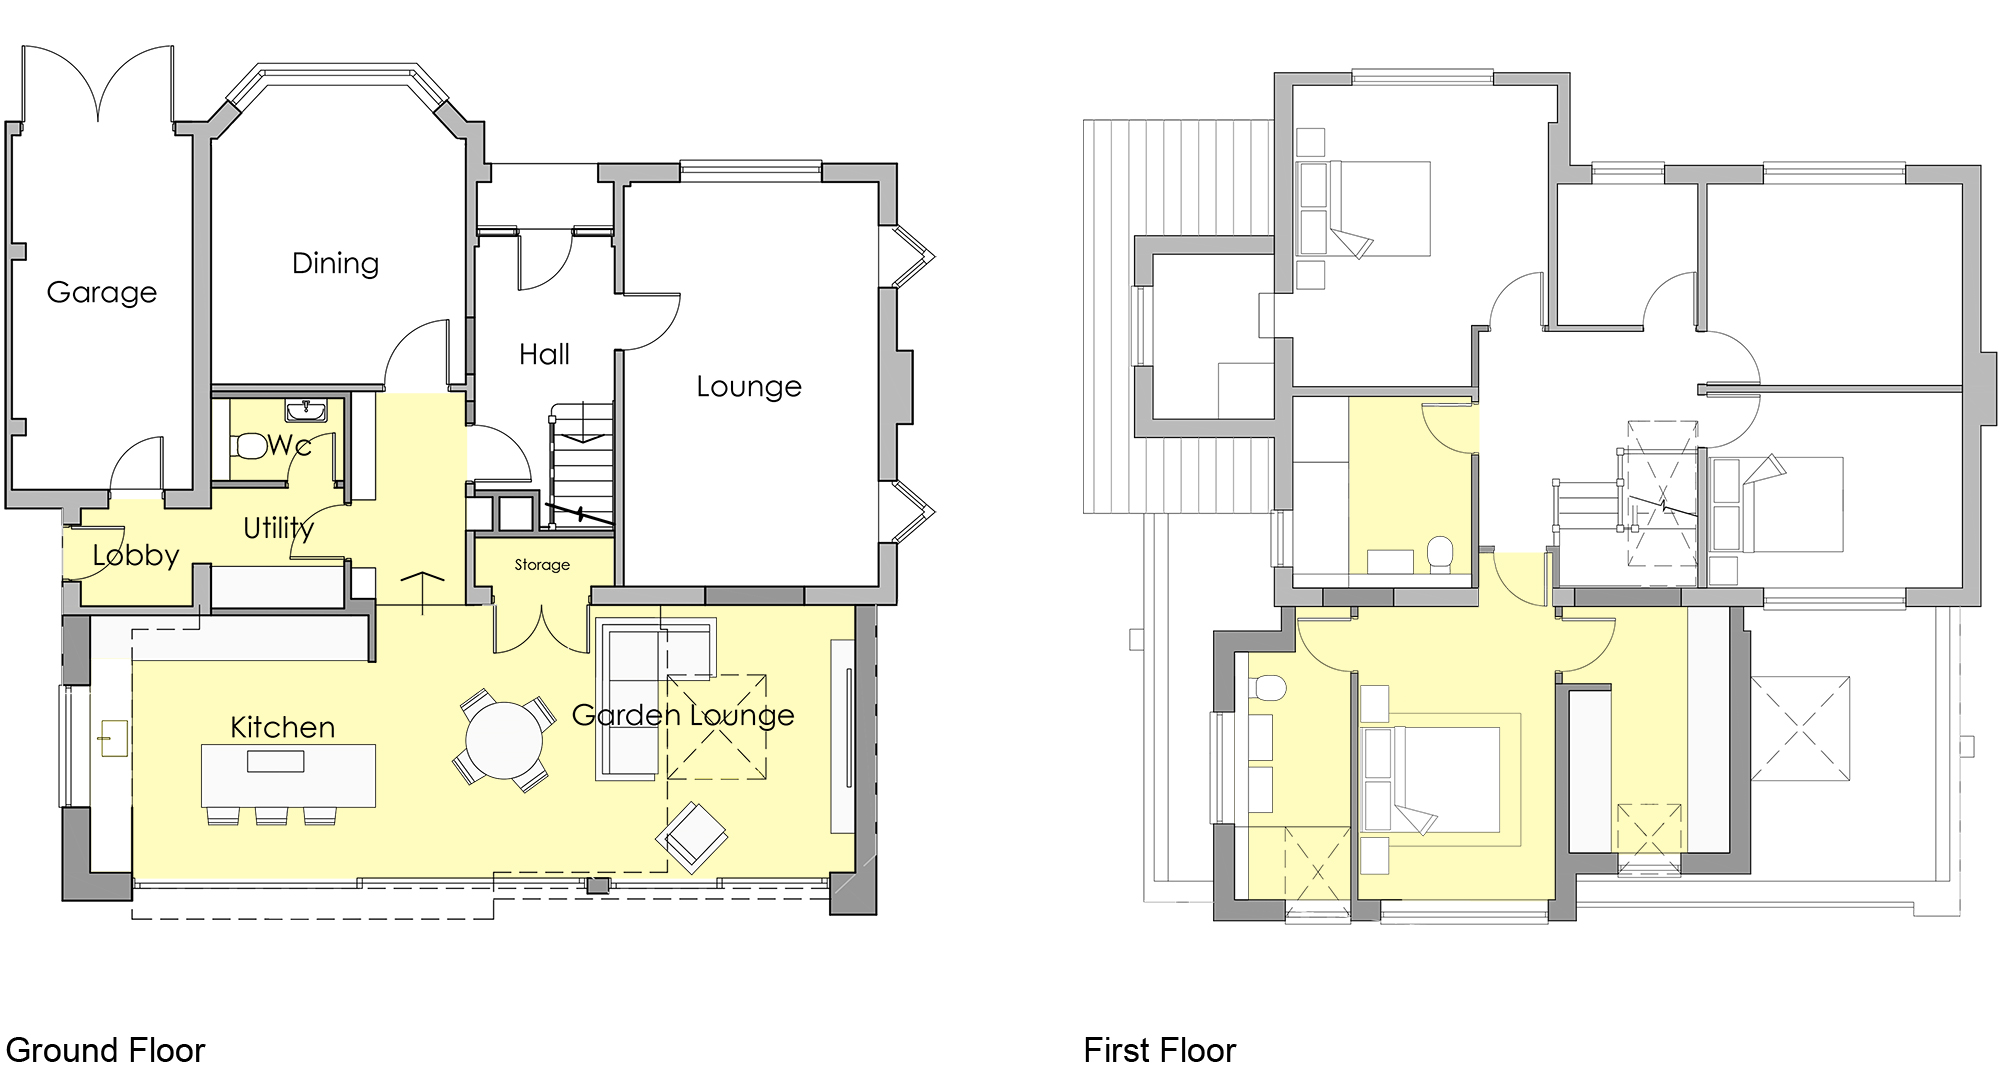 RHJB_HaynesRd_Modern two storey extension